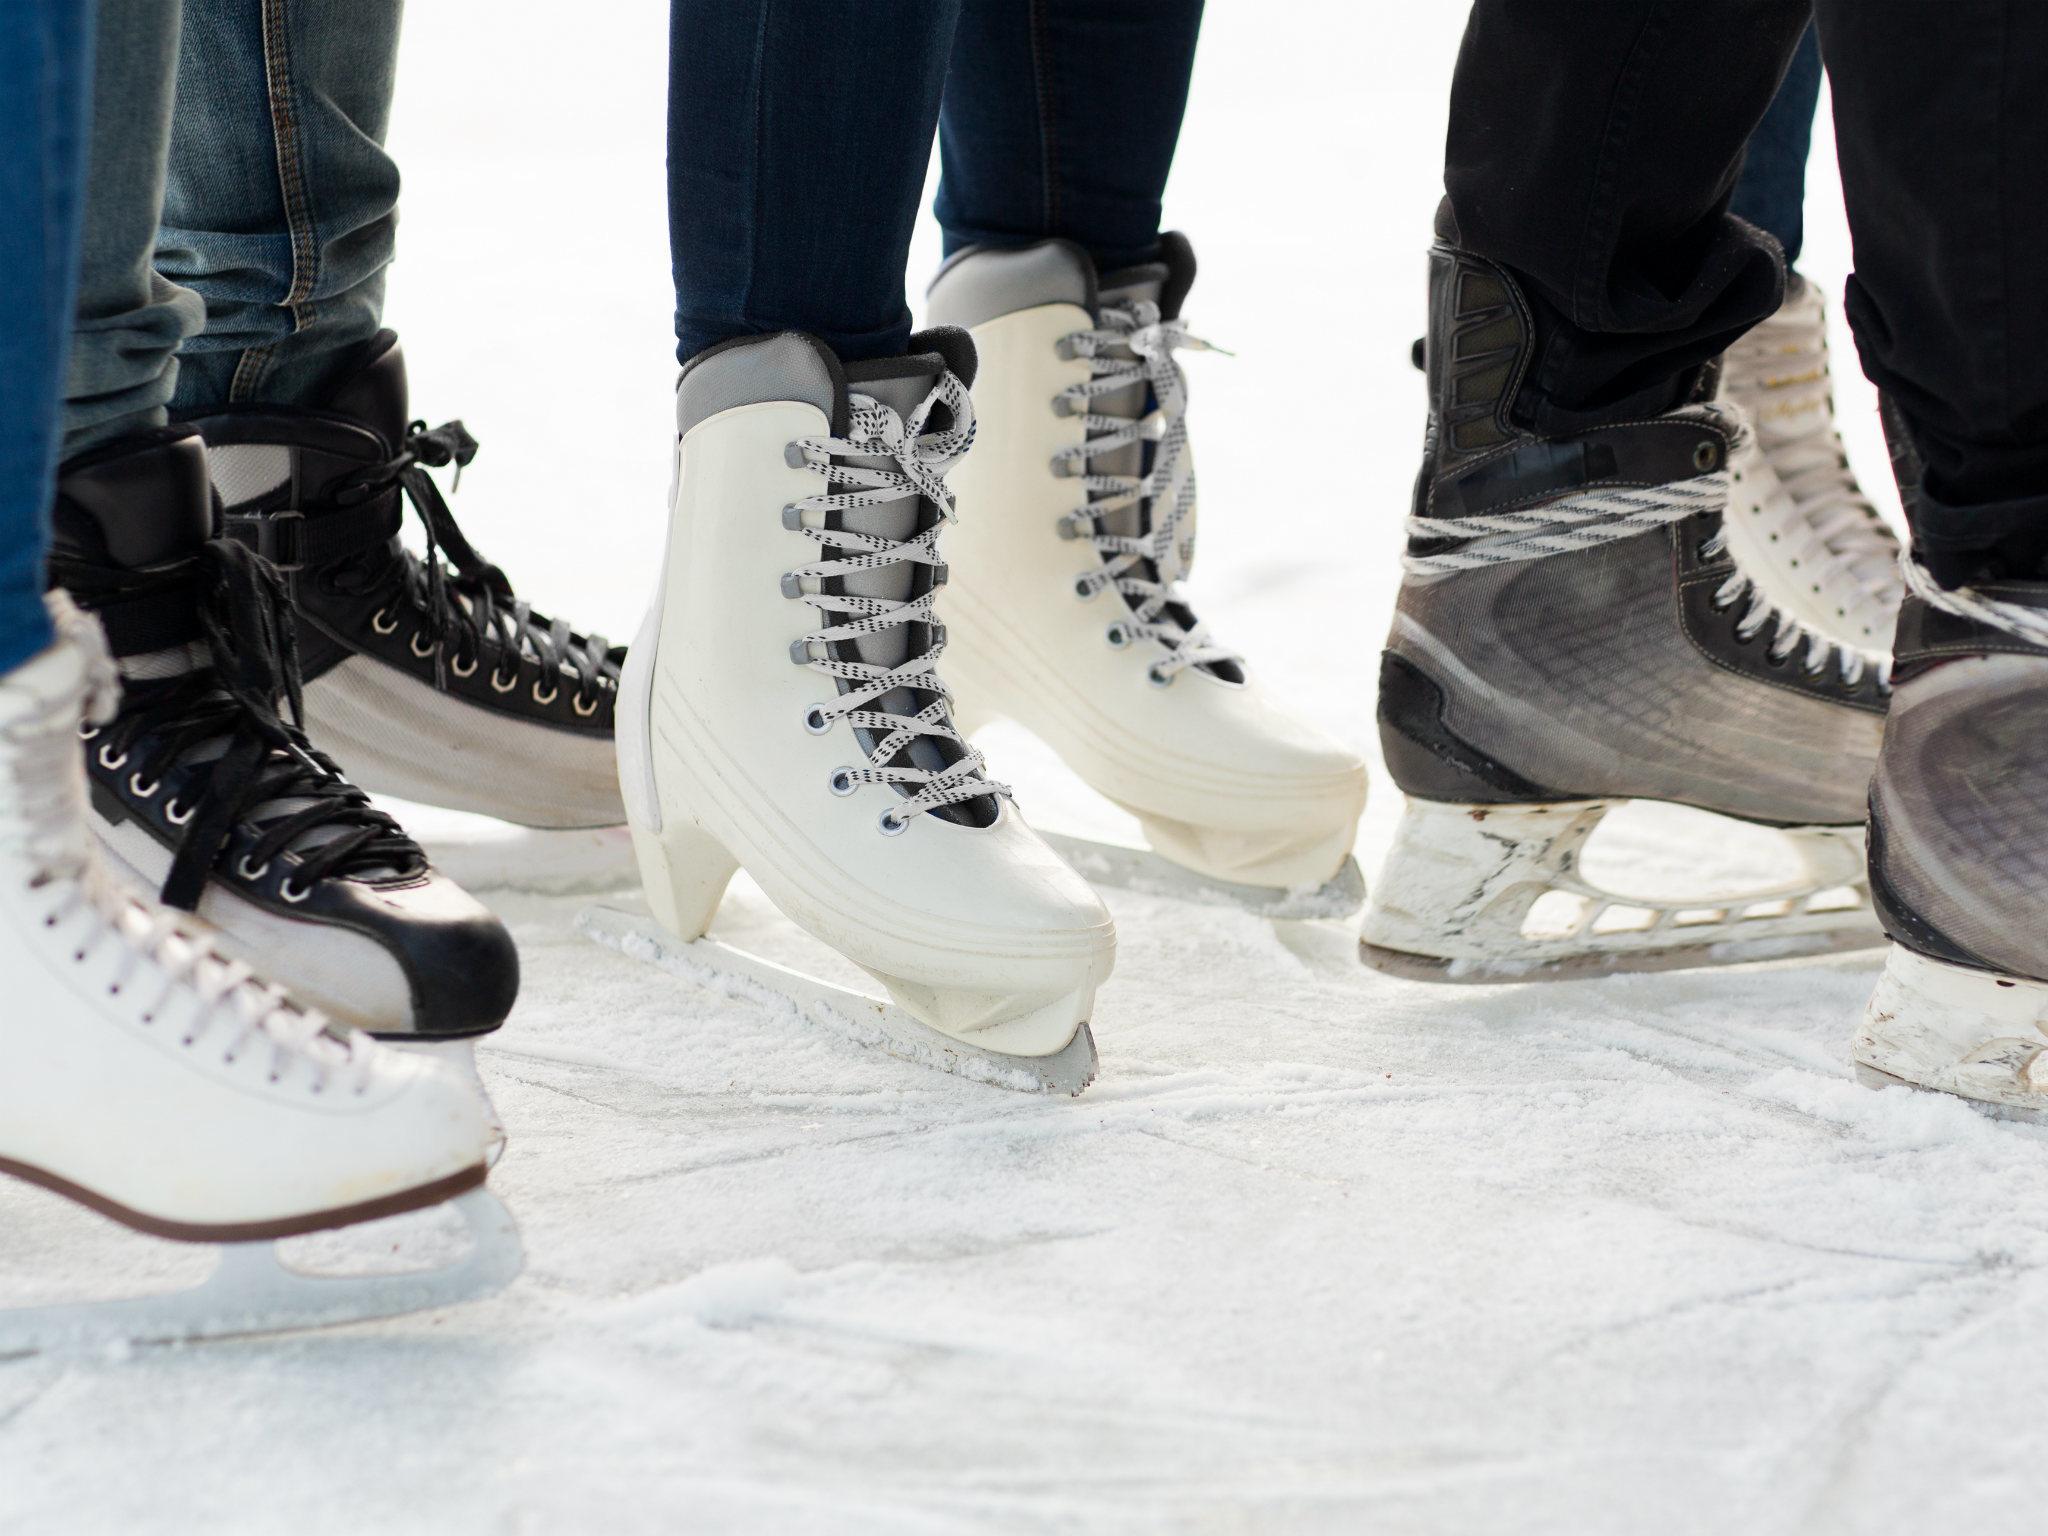 ice skating, silver blades